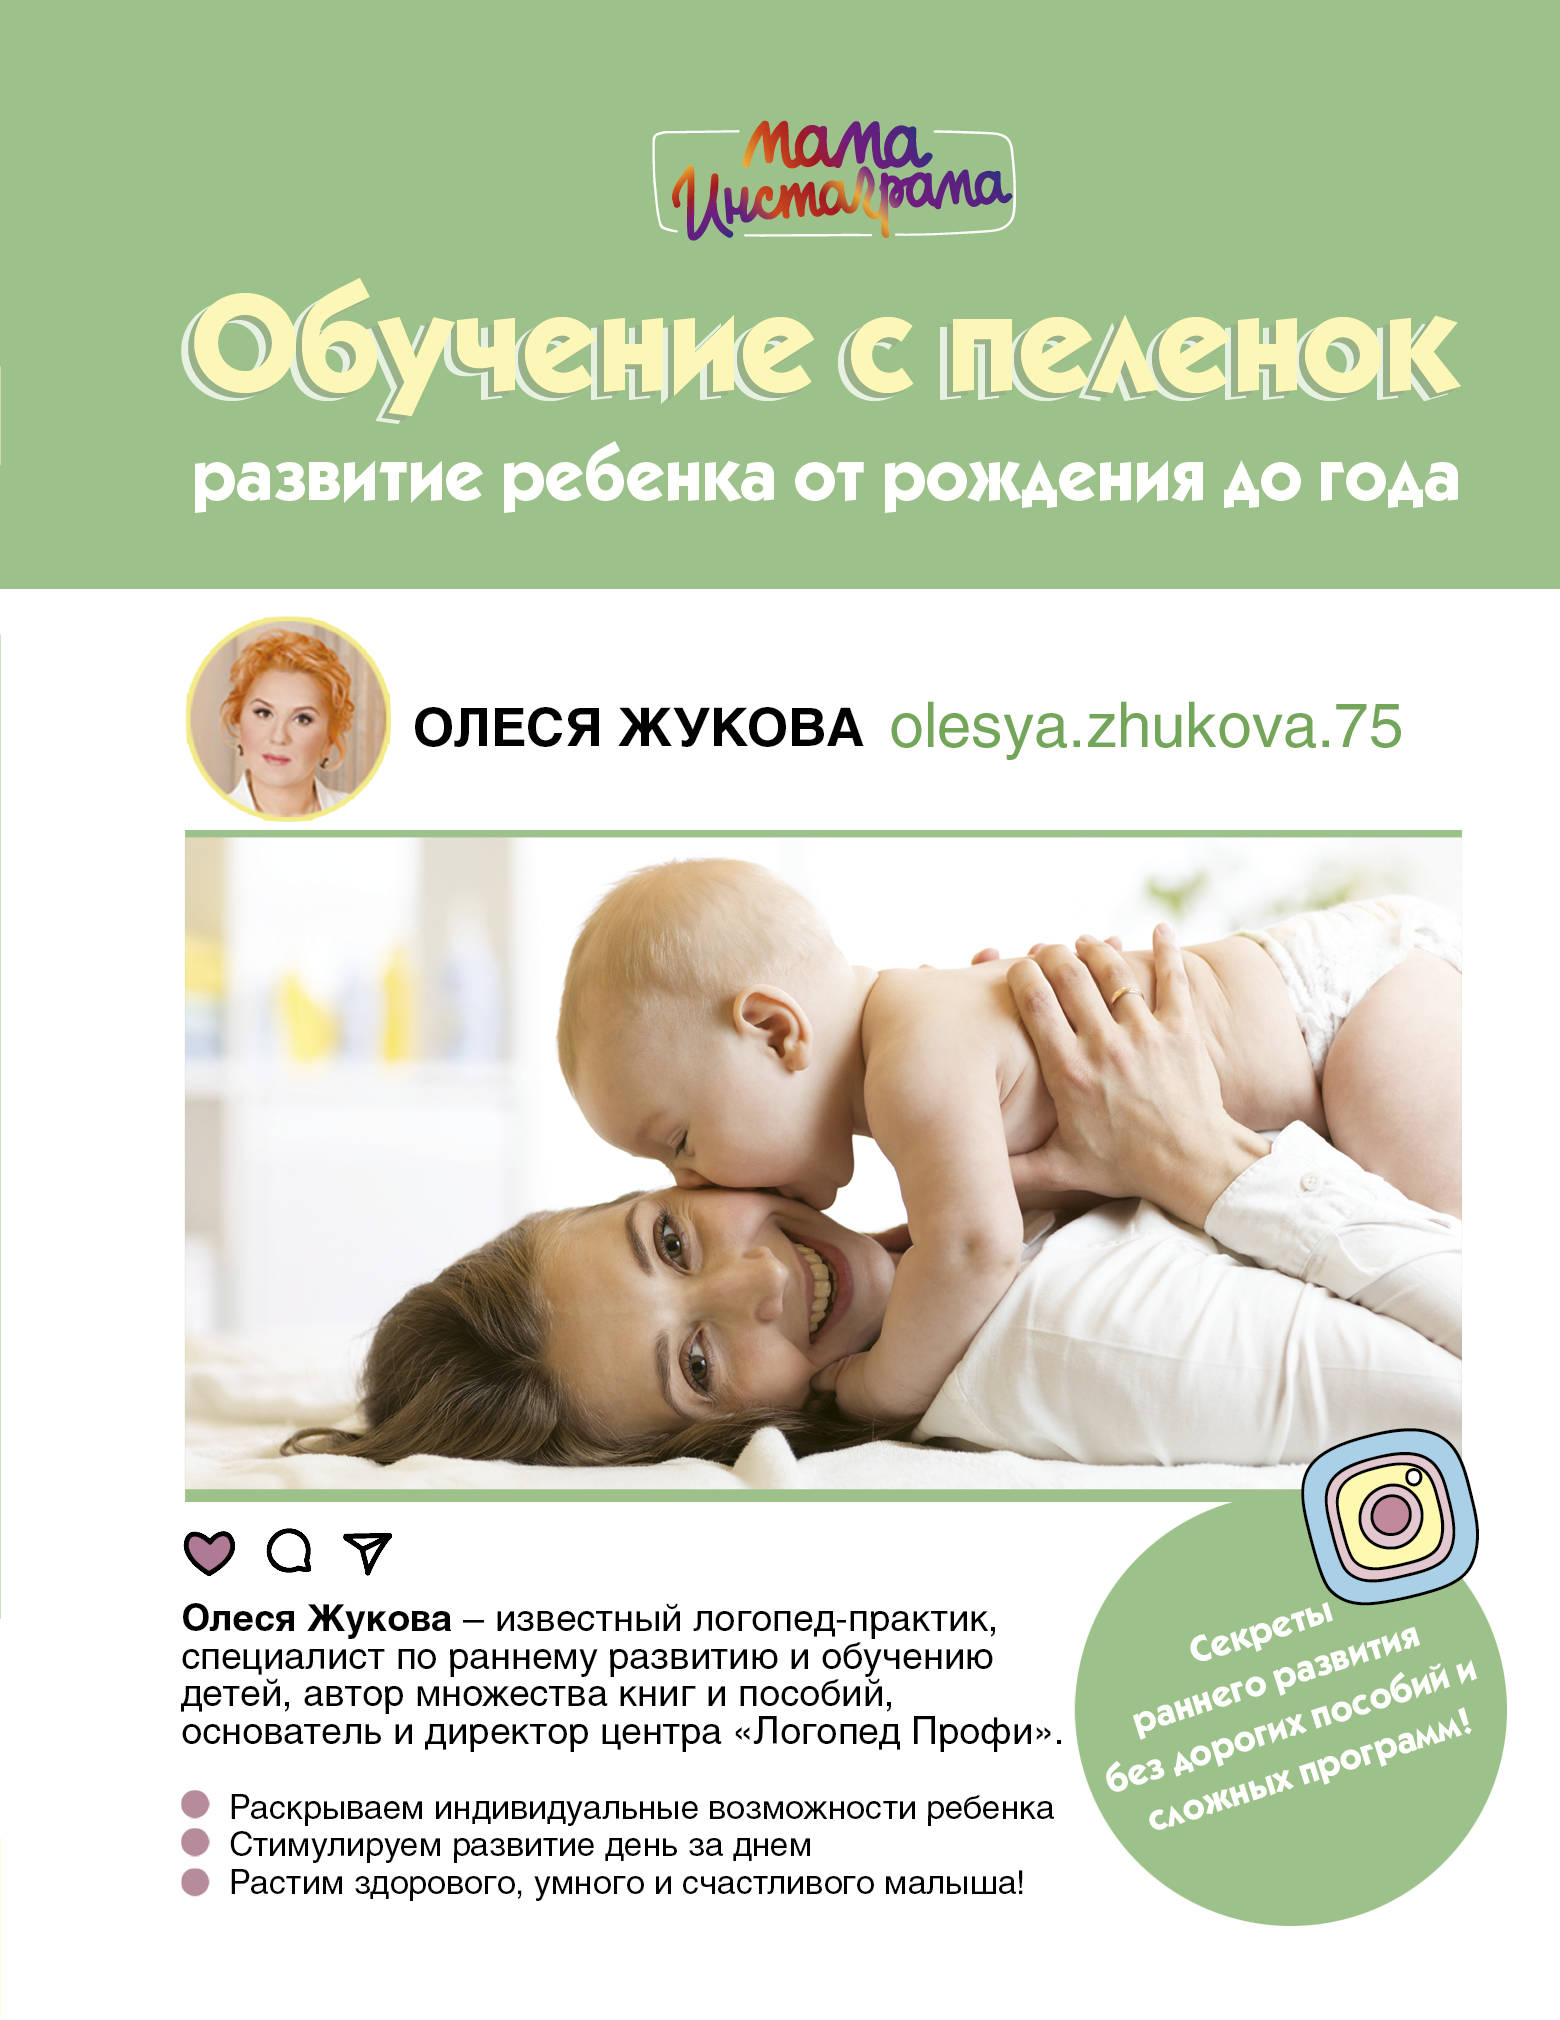 Жукова Олеся Станиславовна Обучение с пеленок. Развитие ребенка от рождения до года